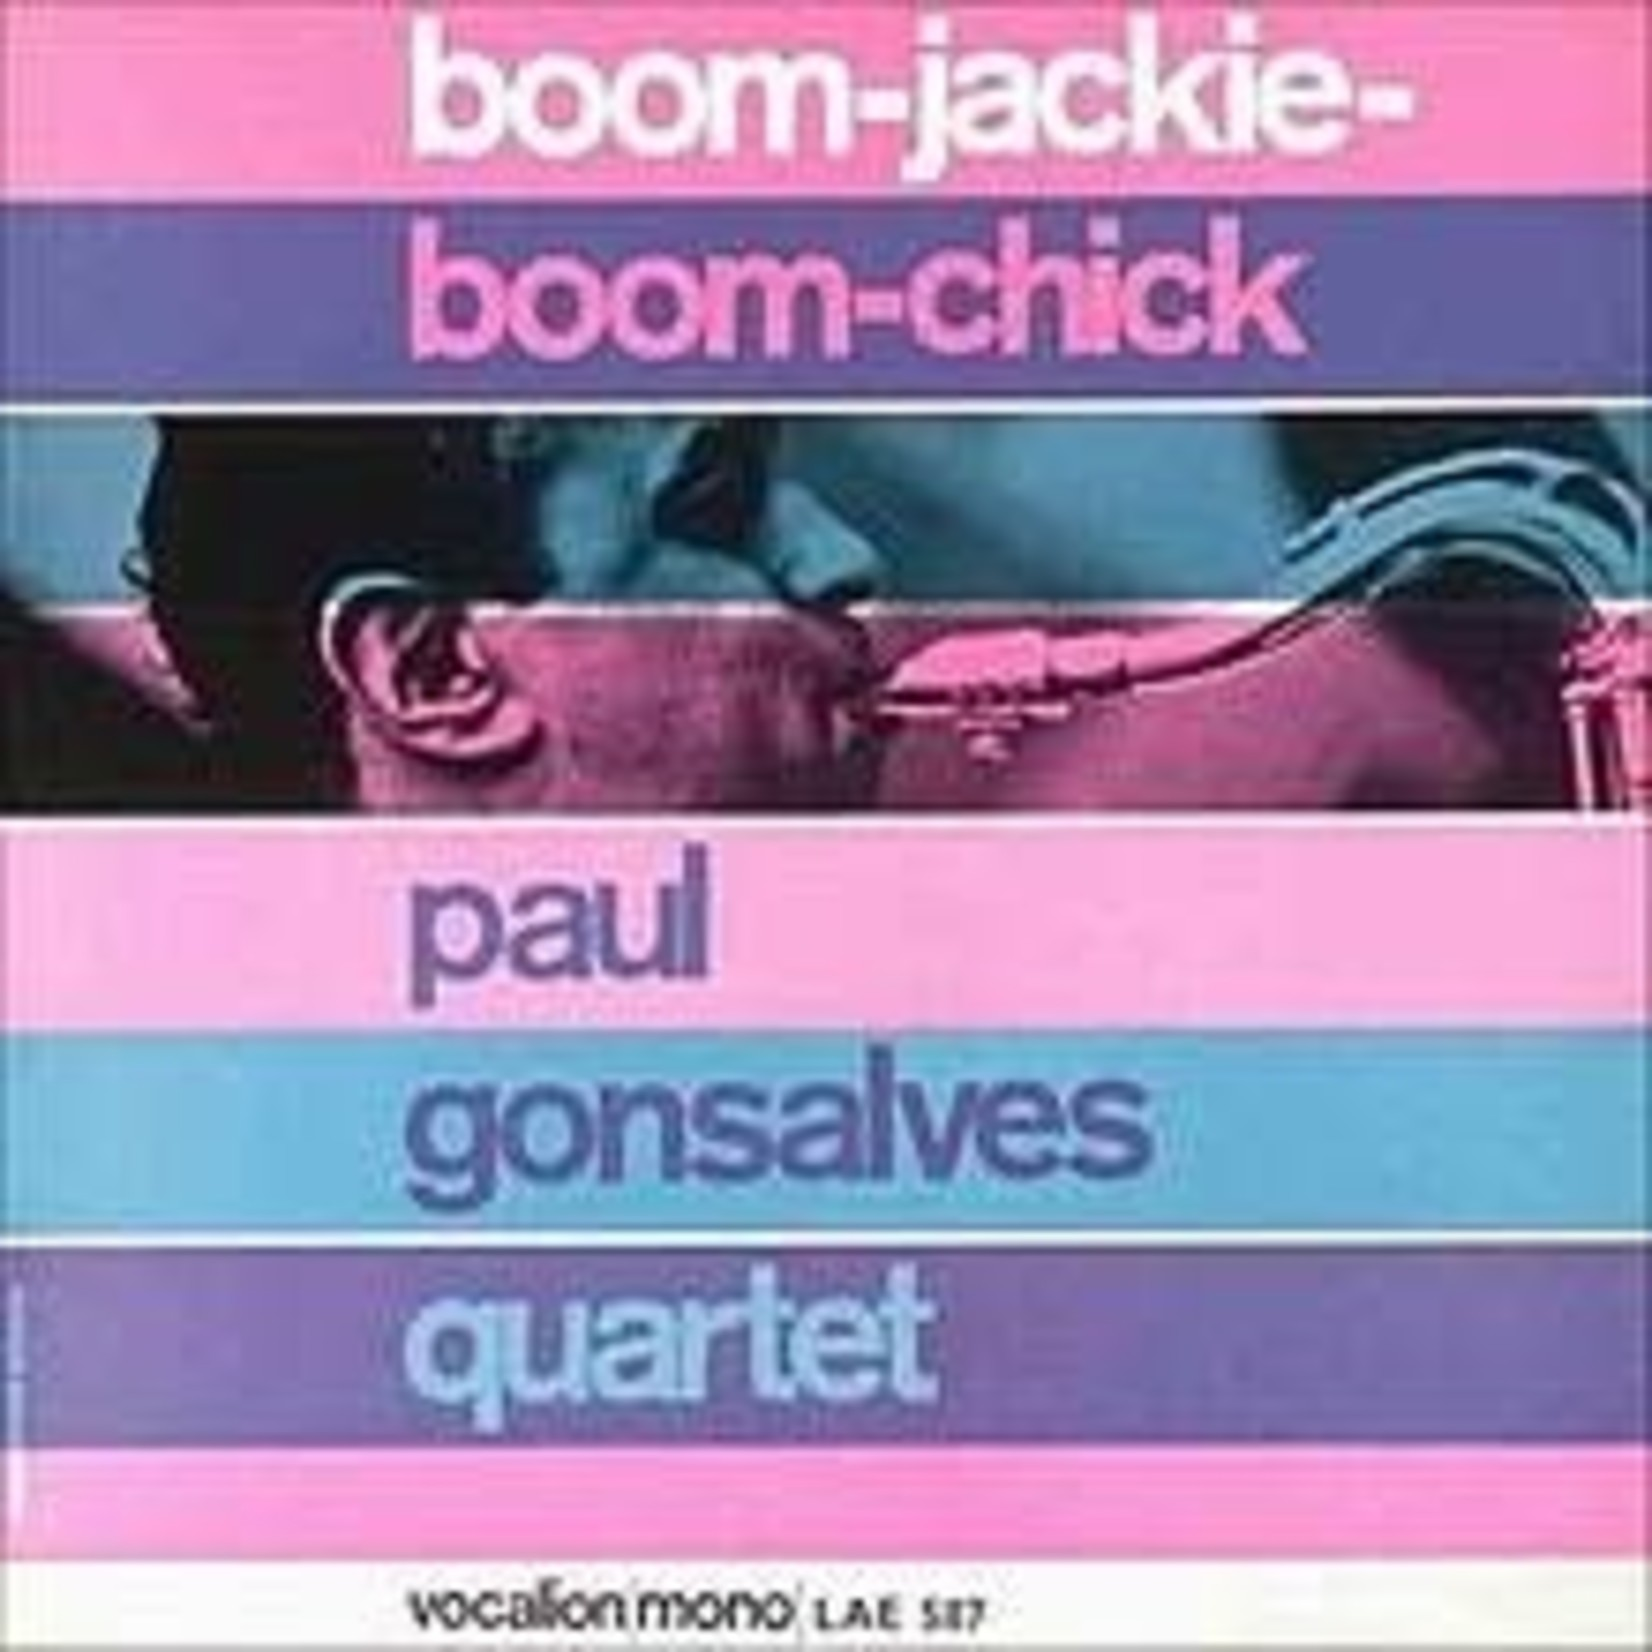 Gonsalves_ Paul Quartet - Boom-Jackie-Boom-chick   (VINYL)